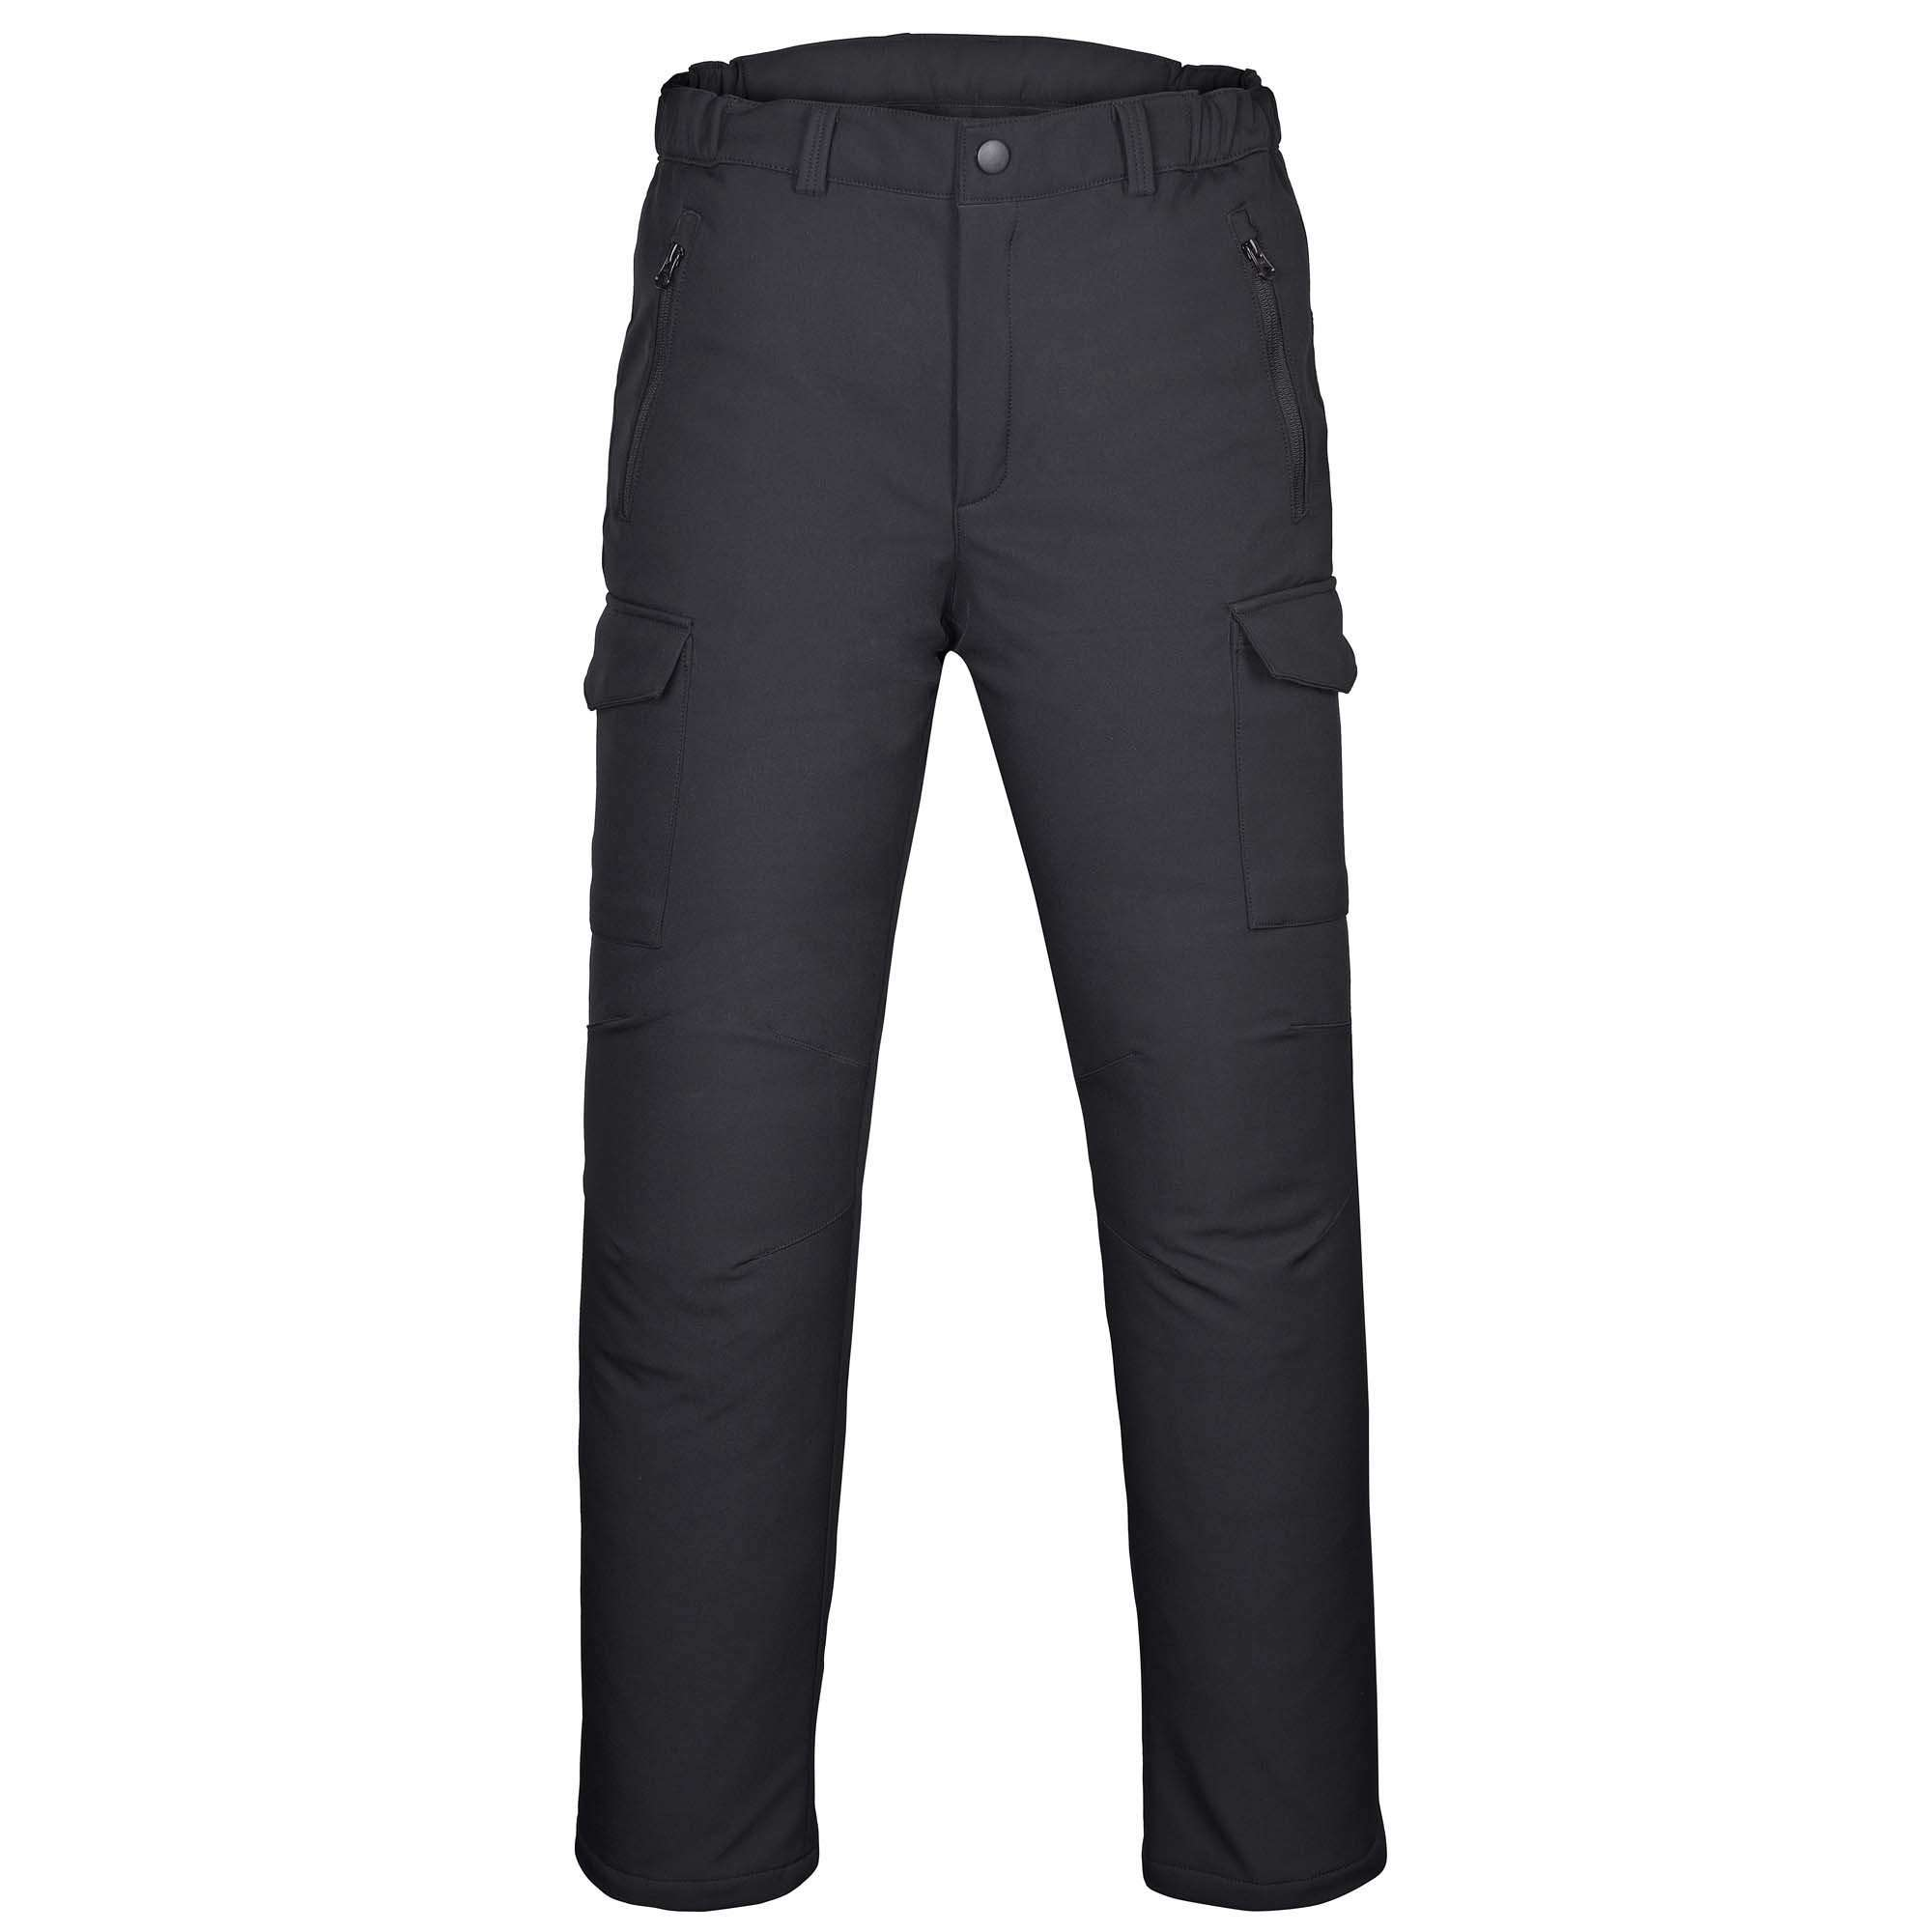 Mens-Water-Repellent-Softshell-Fleece-Lined-Cargo-Pants